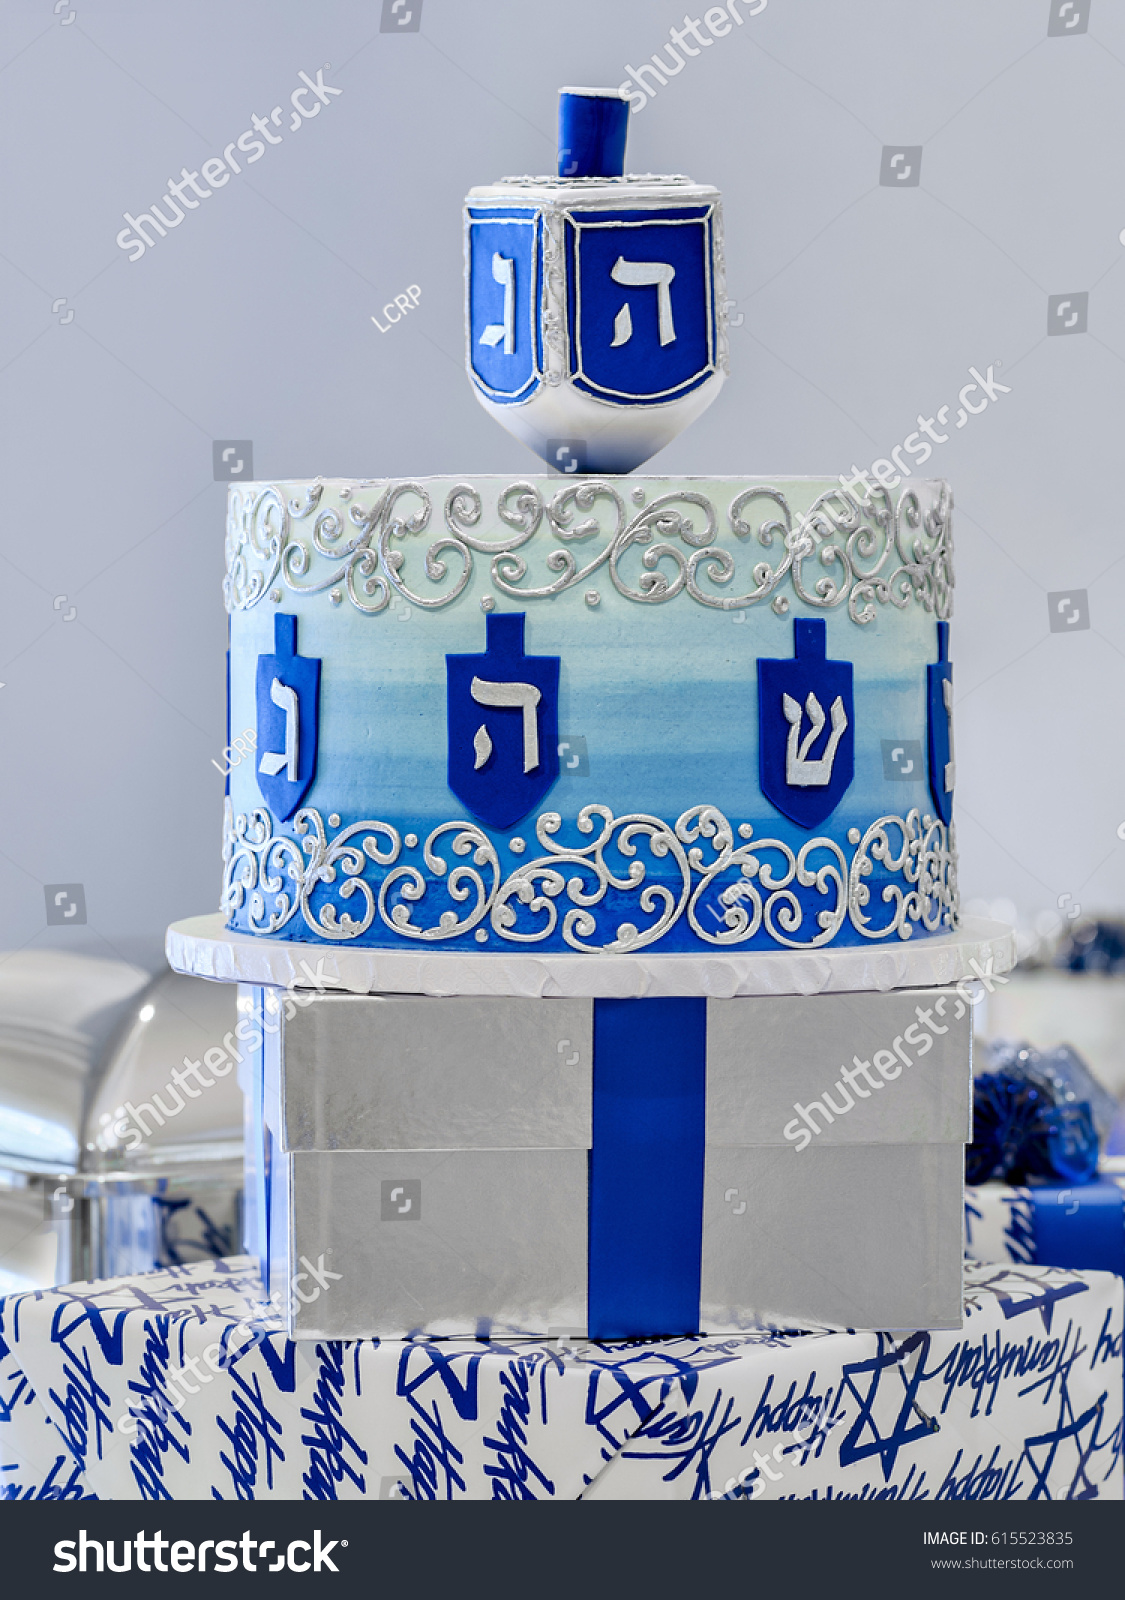 Bright Festive Chanukah Hanukkah Cake Centrepiece Stock Photo Edit